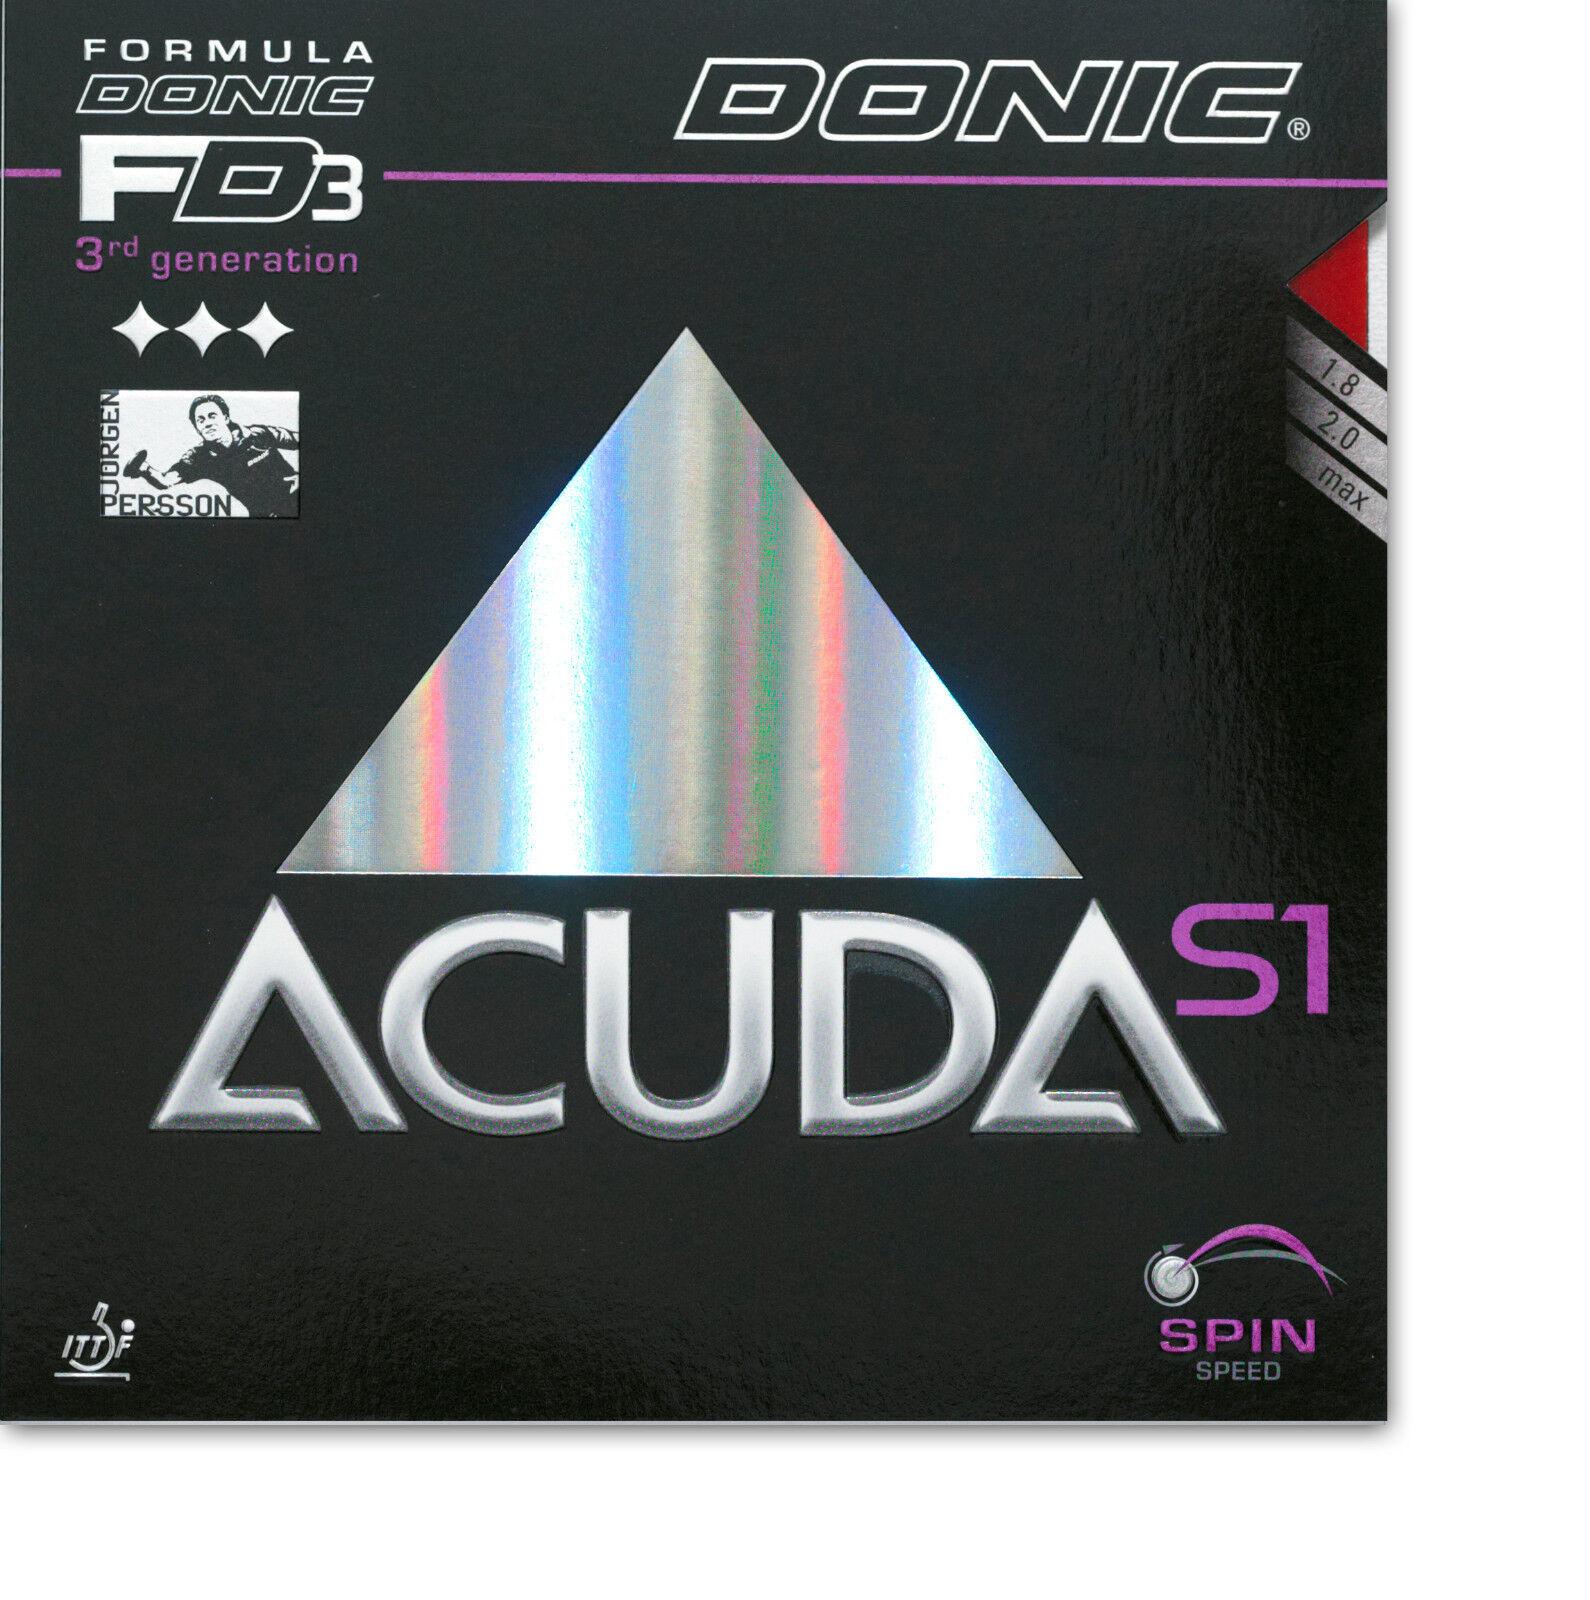 DONIC Acuda S1 2,0mm 2,0mm 2,0mm schwarz  NEU   OVP 447000